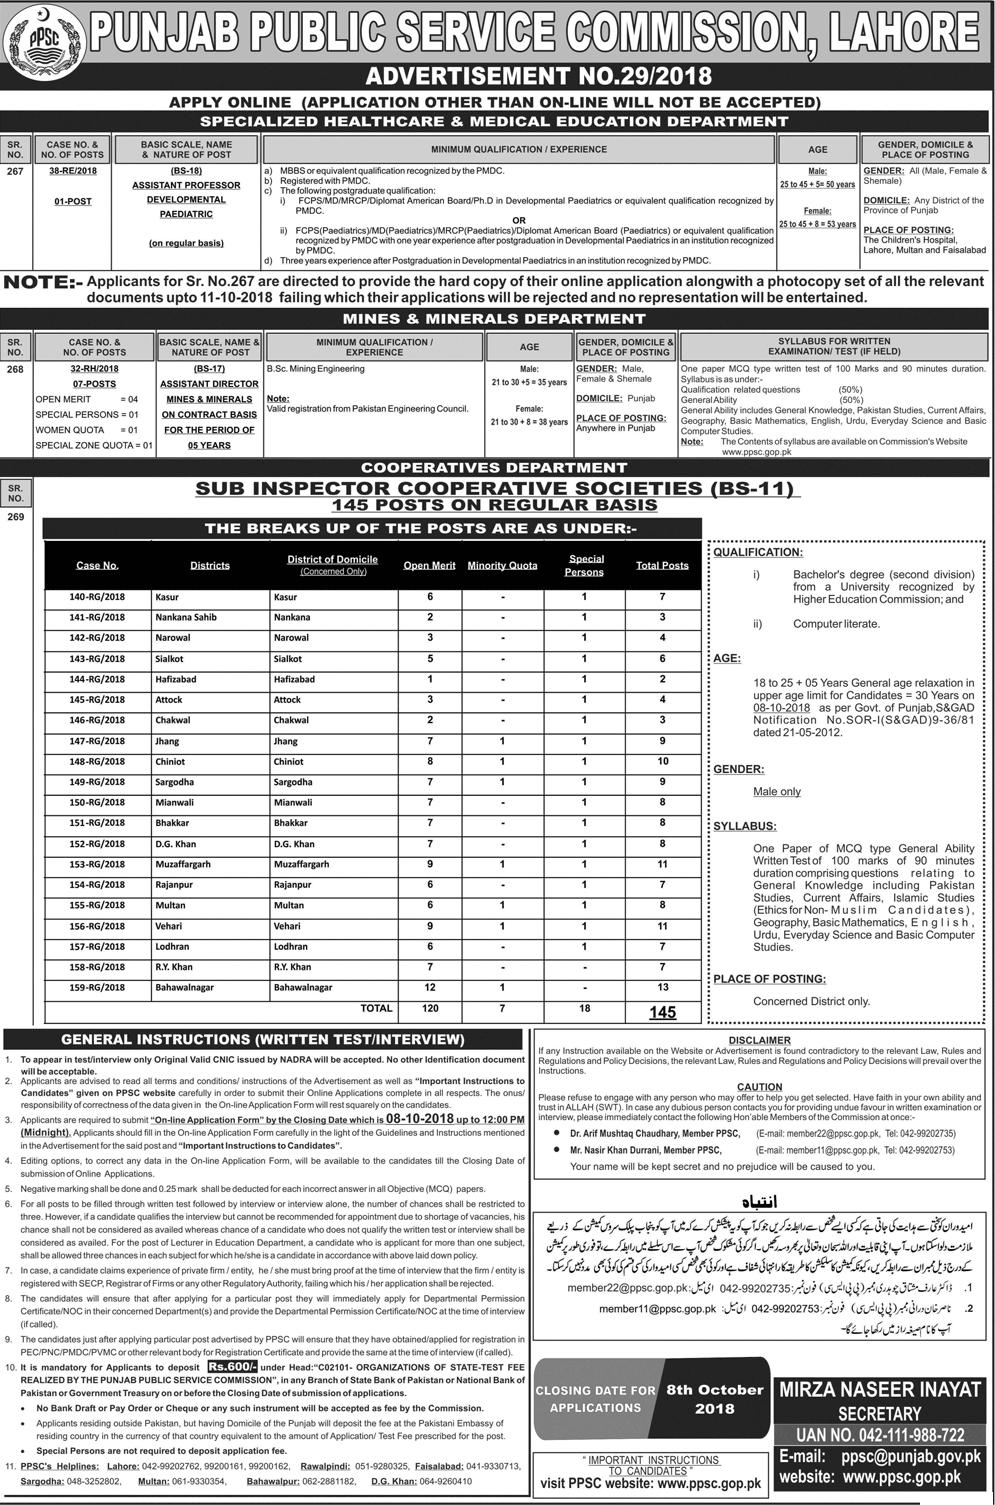 PPSC Jobs Advertisement No 29/2018 Sub Inspector Application Form Download